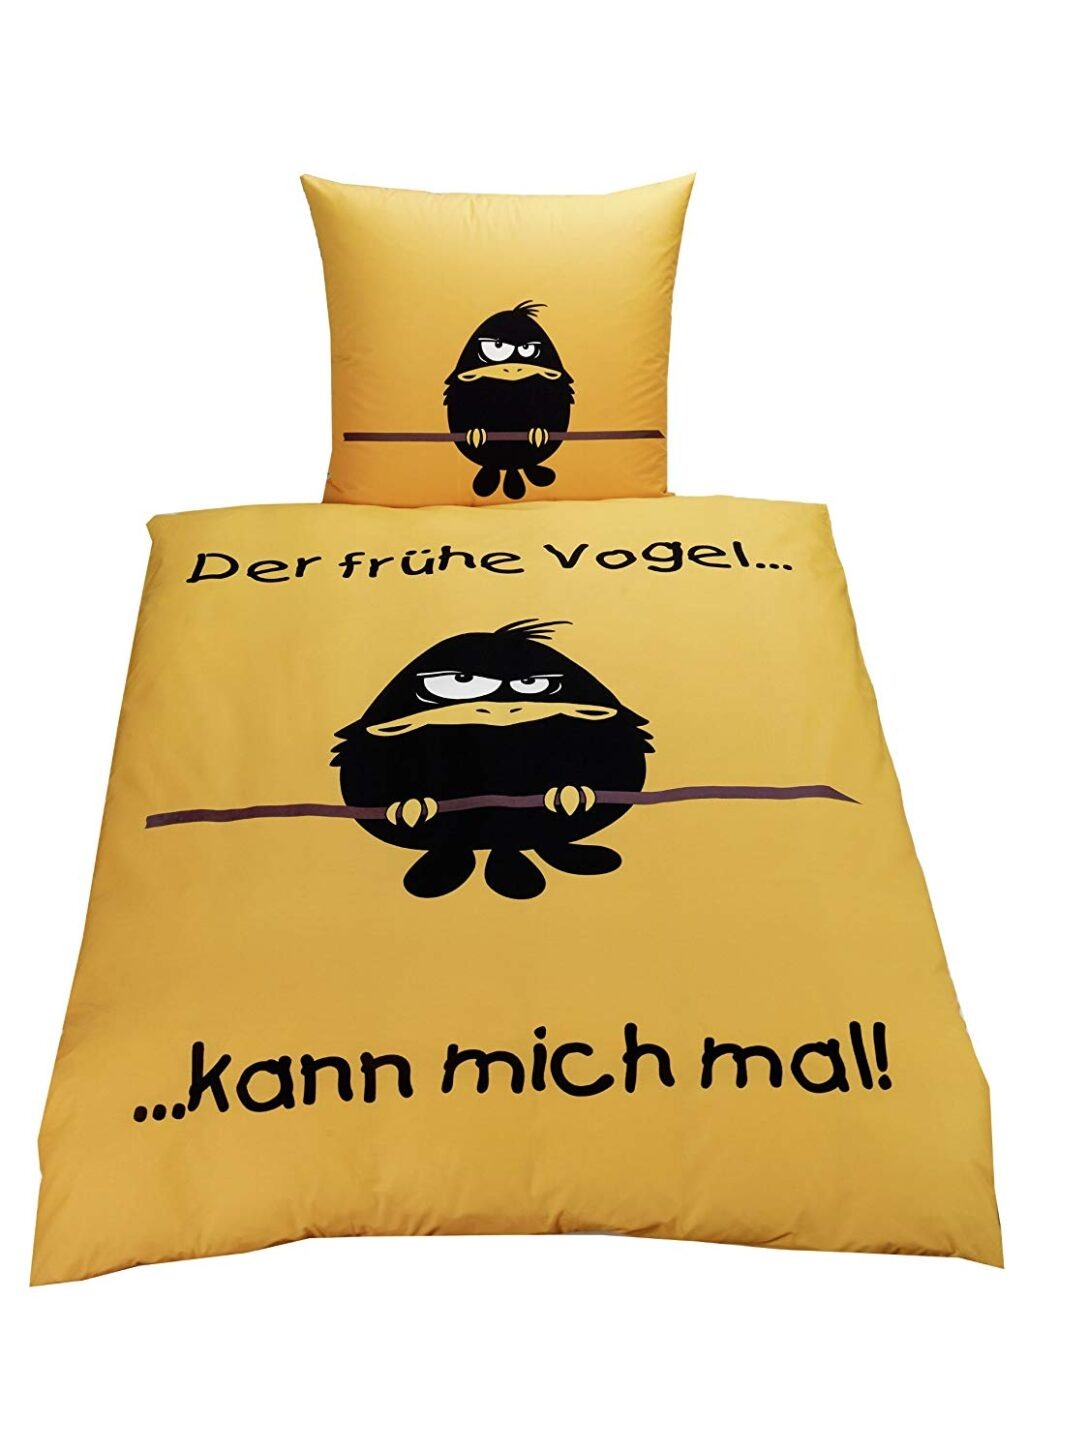 Large Size of Bettwsche 200x200 Sprche Teenager Coole 155x220 Kche T Shirt Lustige T Shirt Sprüche Bettwäsche Wohnzimmer Lustige Bettwäsche 155x220